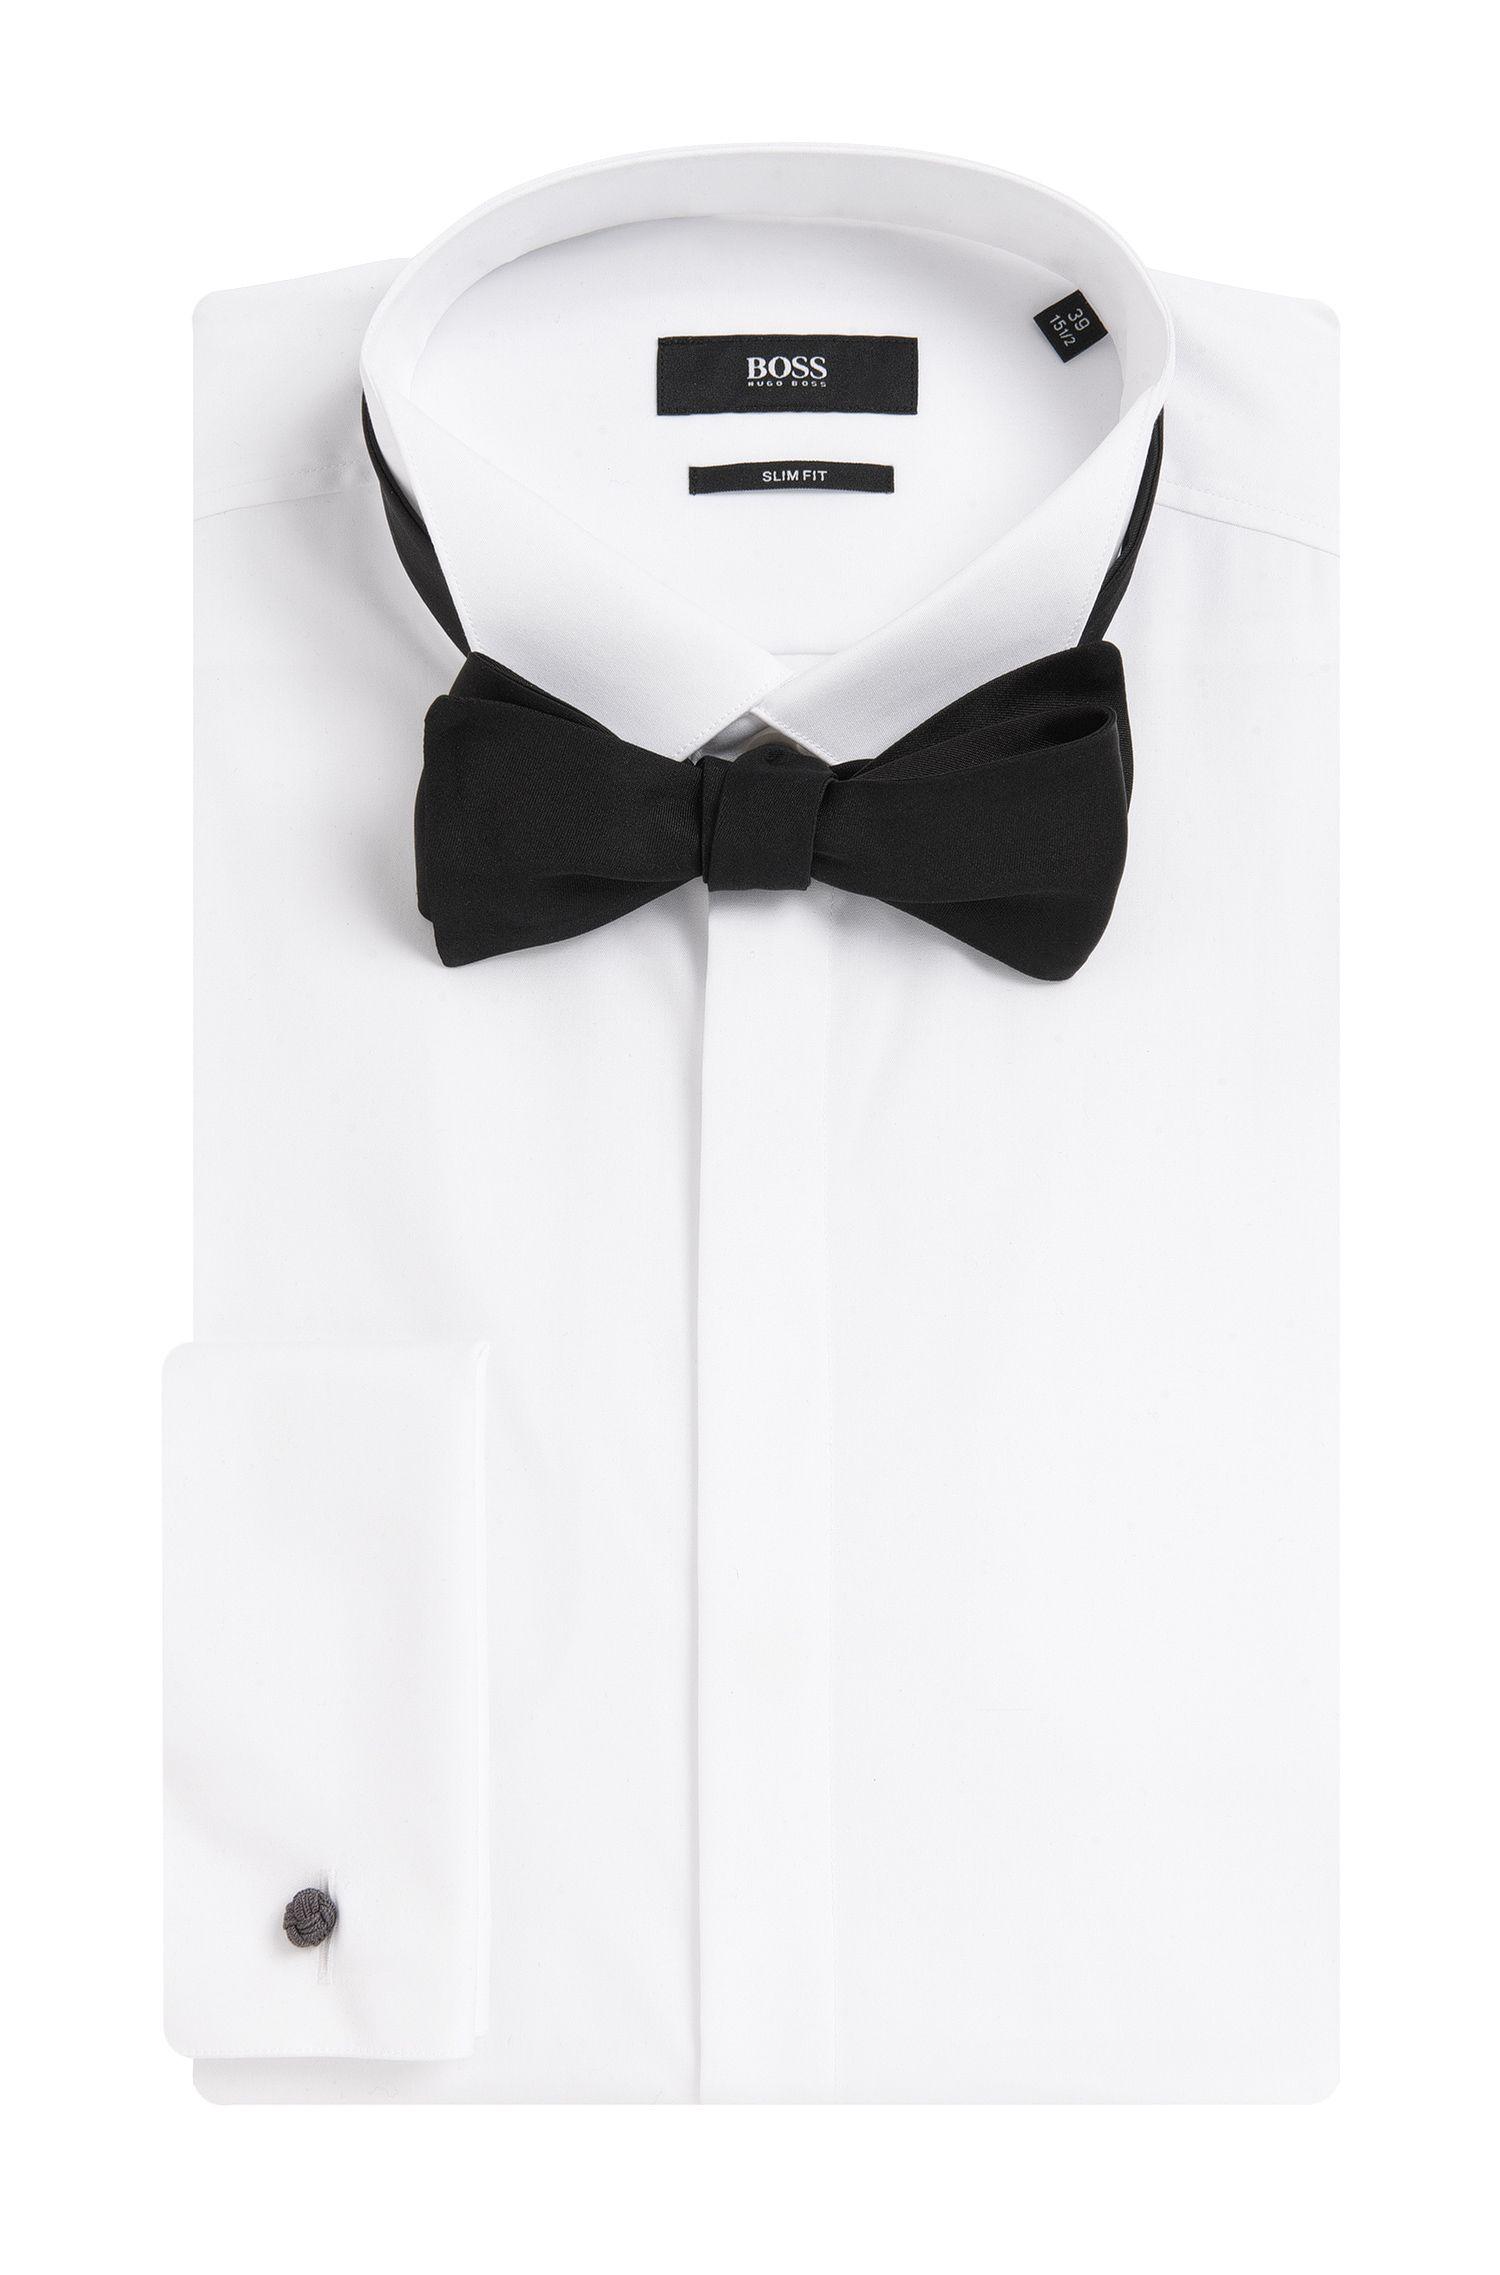 Self-Tie Italian Silk Bow Tie, Black